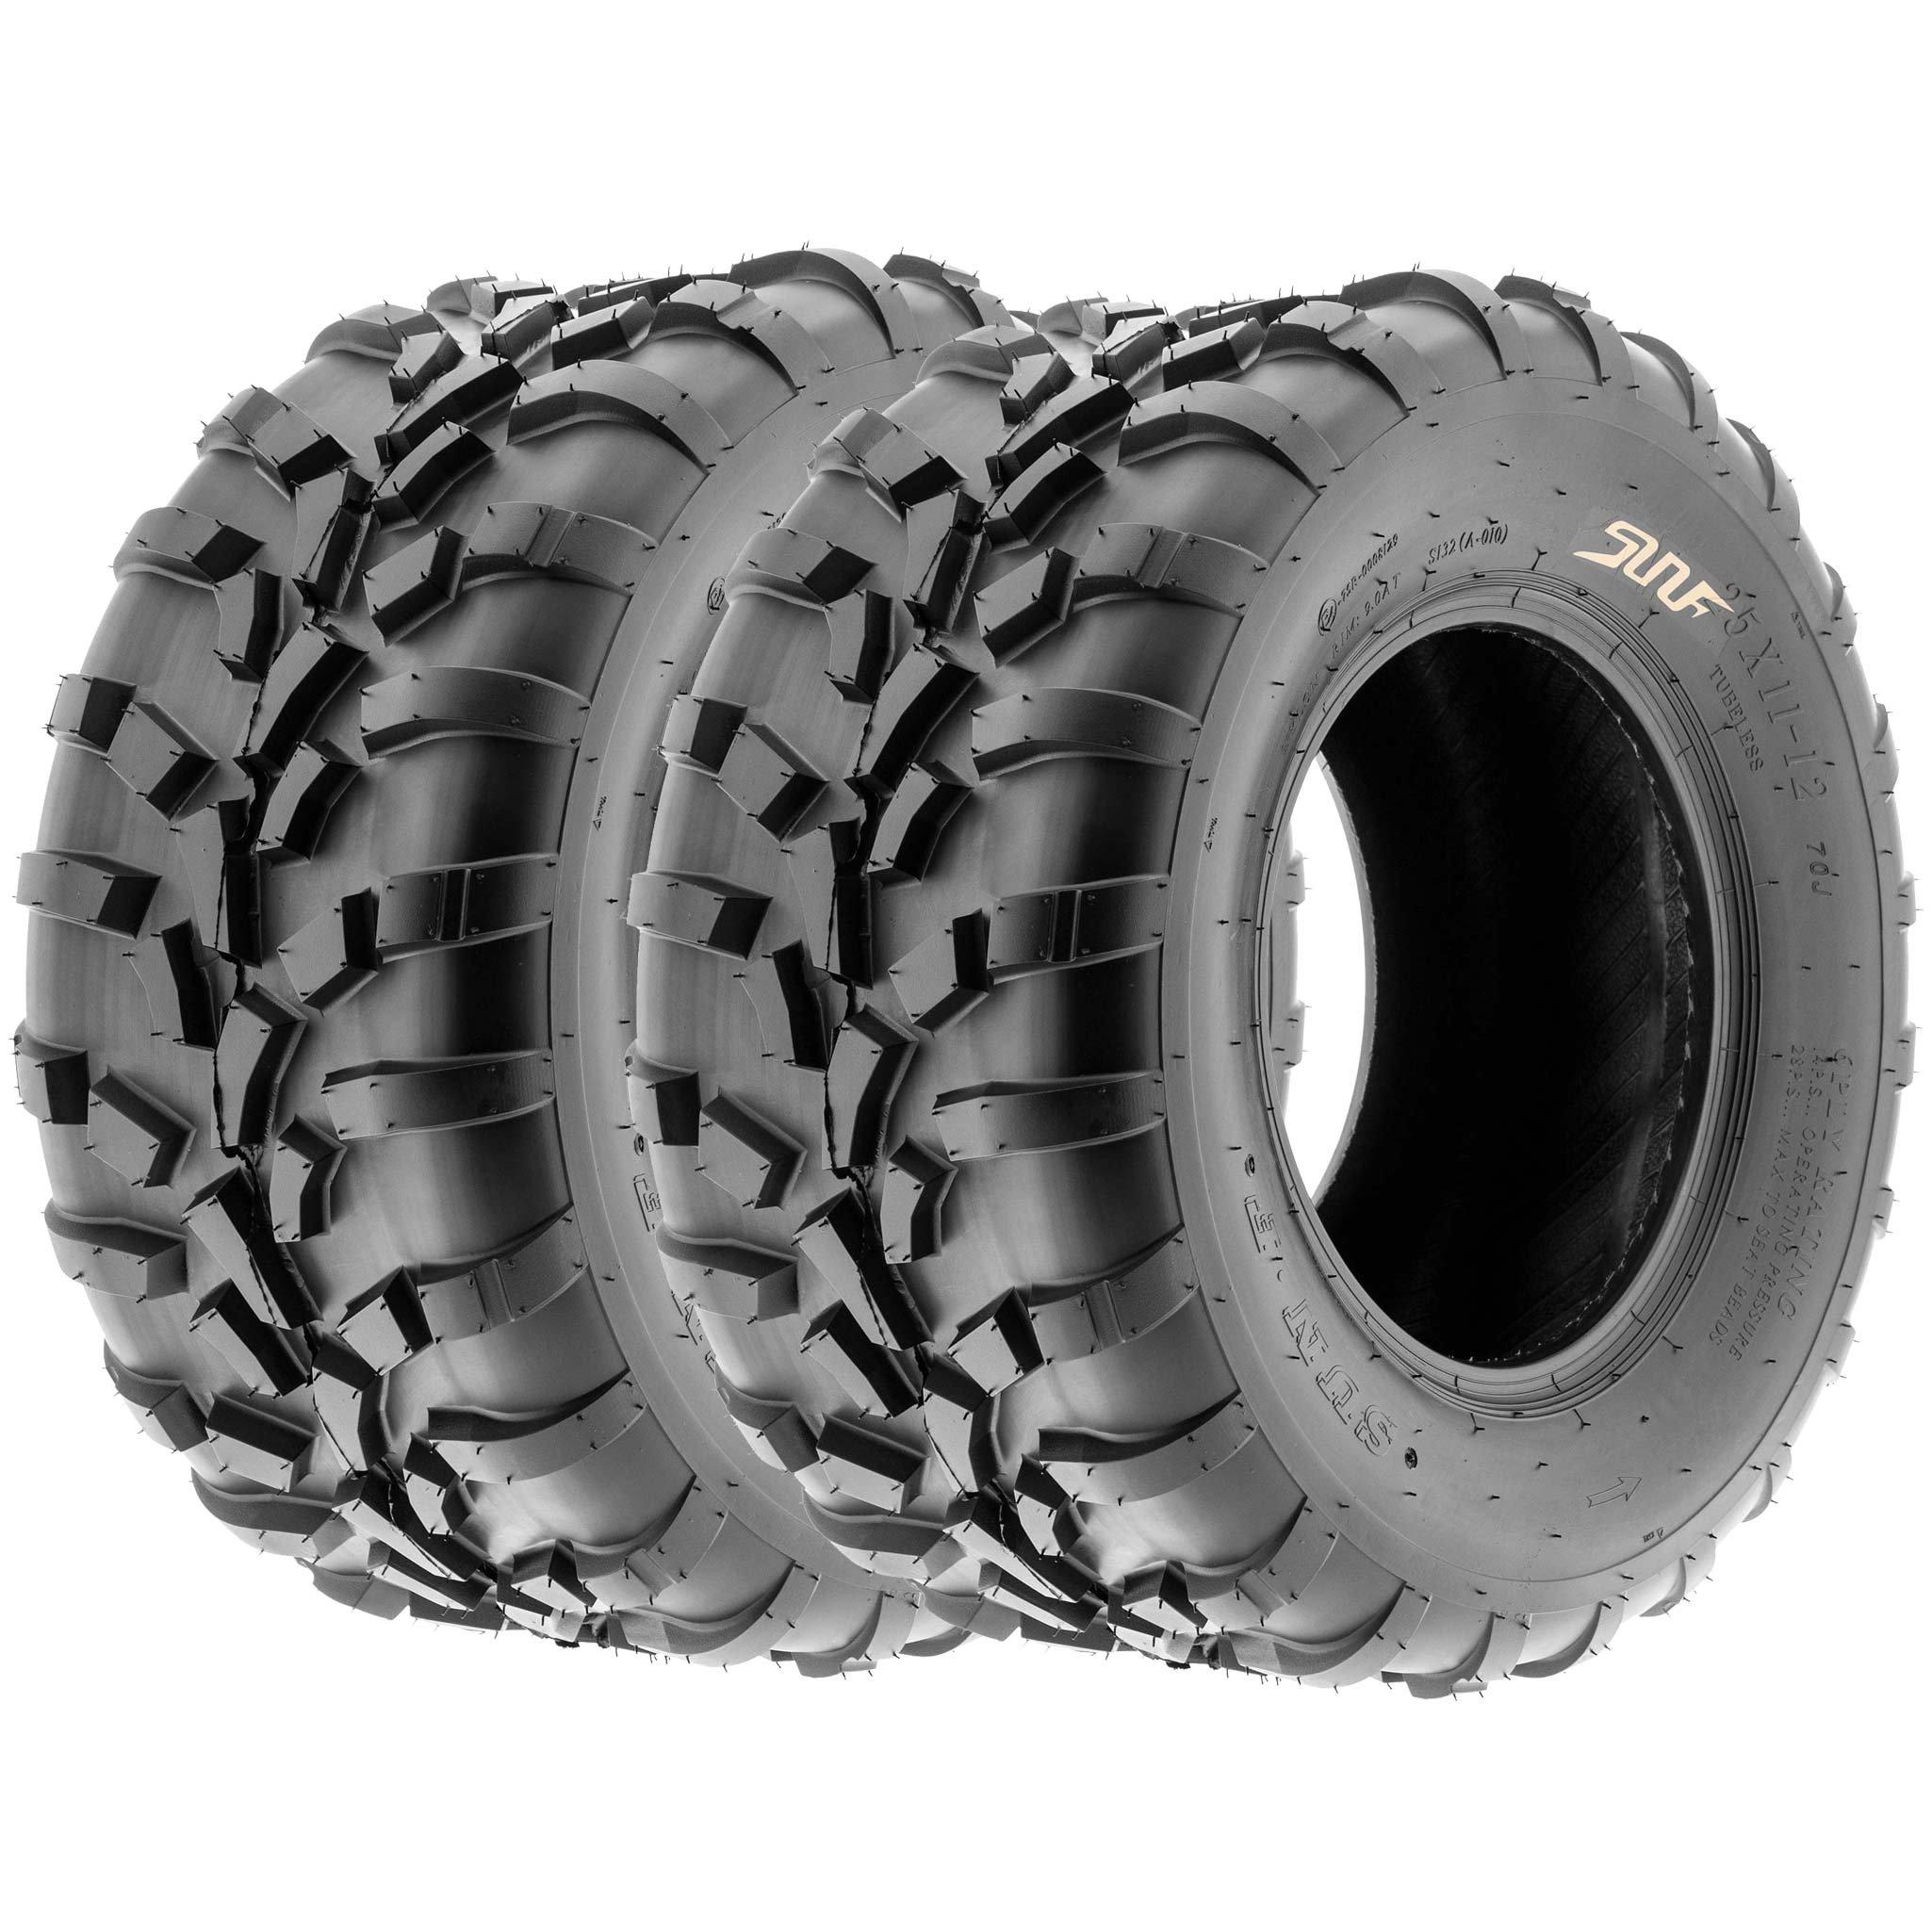 SunF All Terrain ATV UTV Sport Tires 25x11-10 25x11x10 6 PR A010 (Set pair of 2)